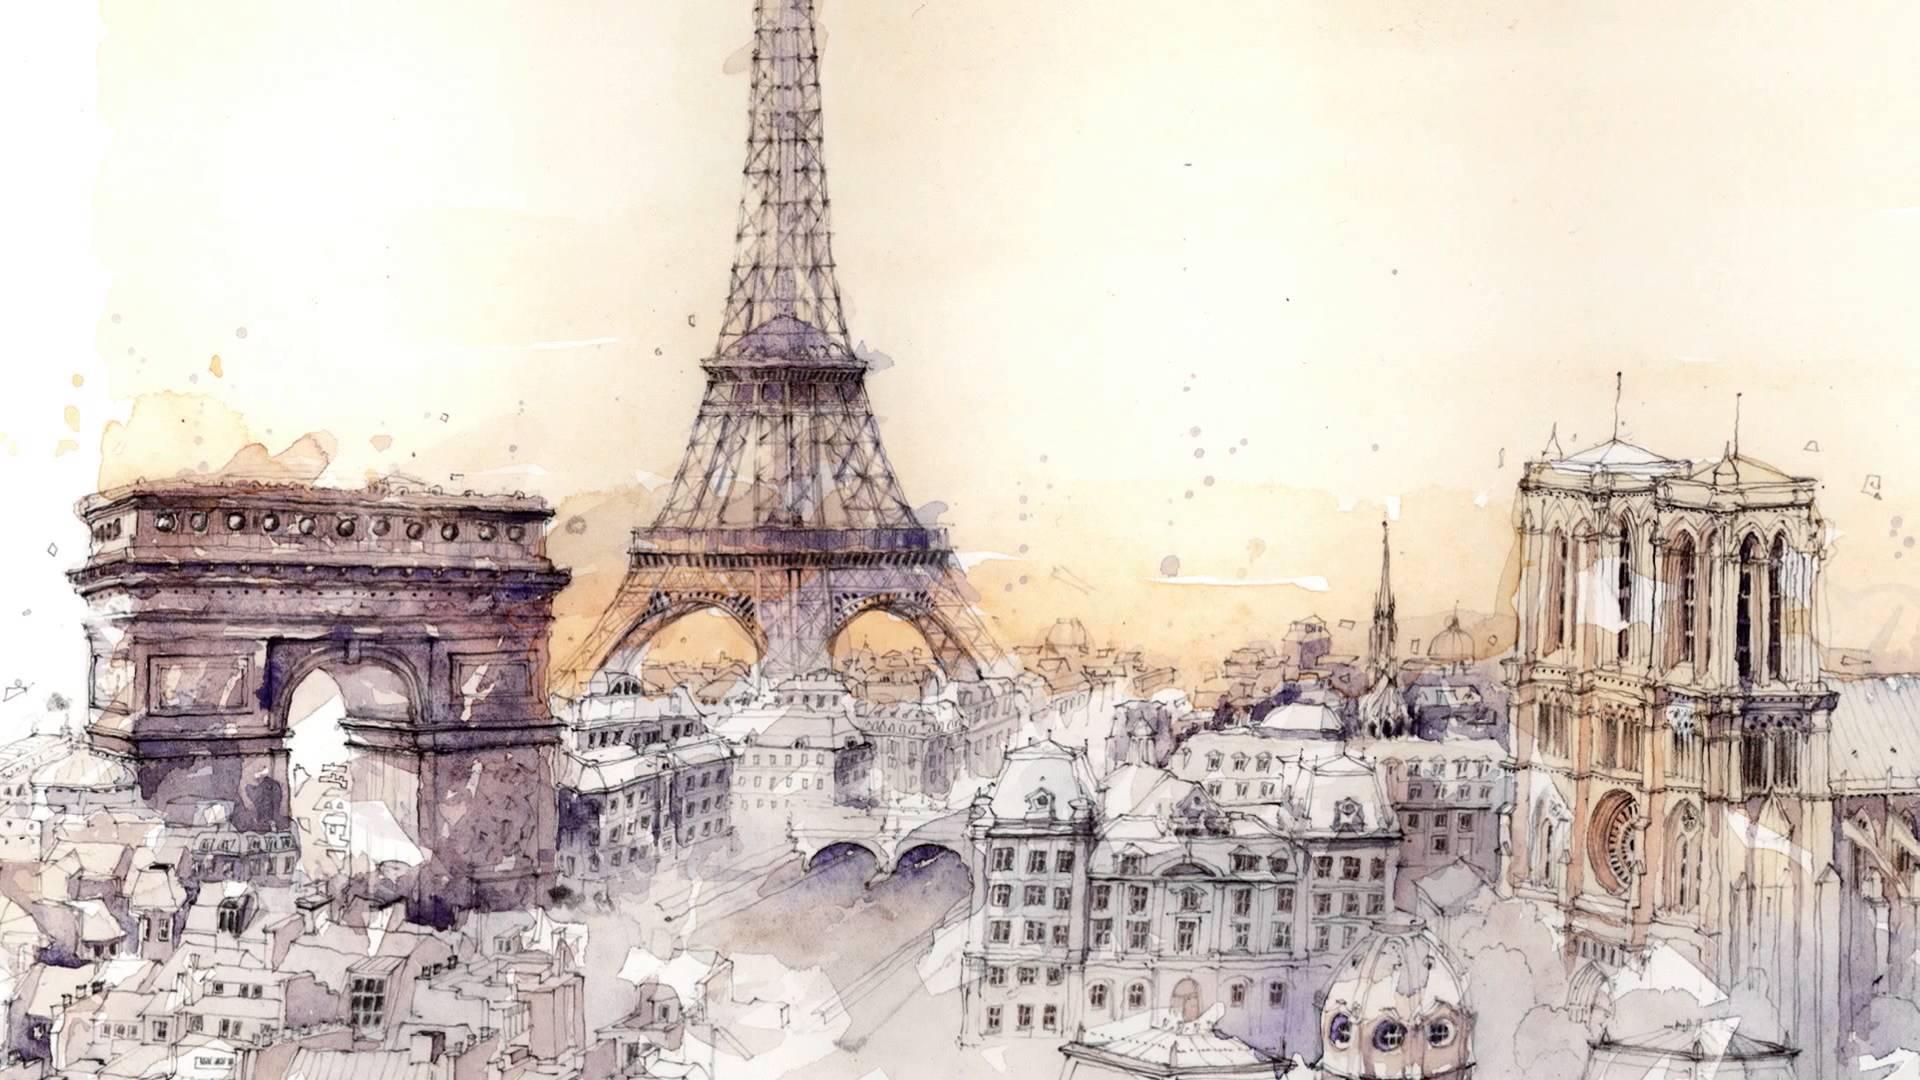 Download Wallpaper City Sketch